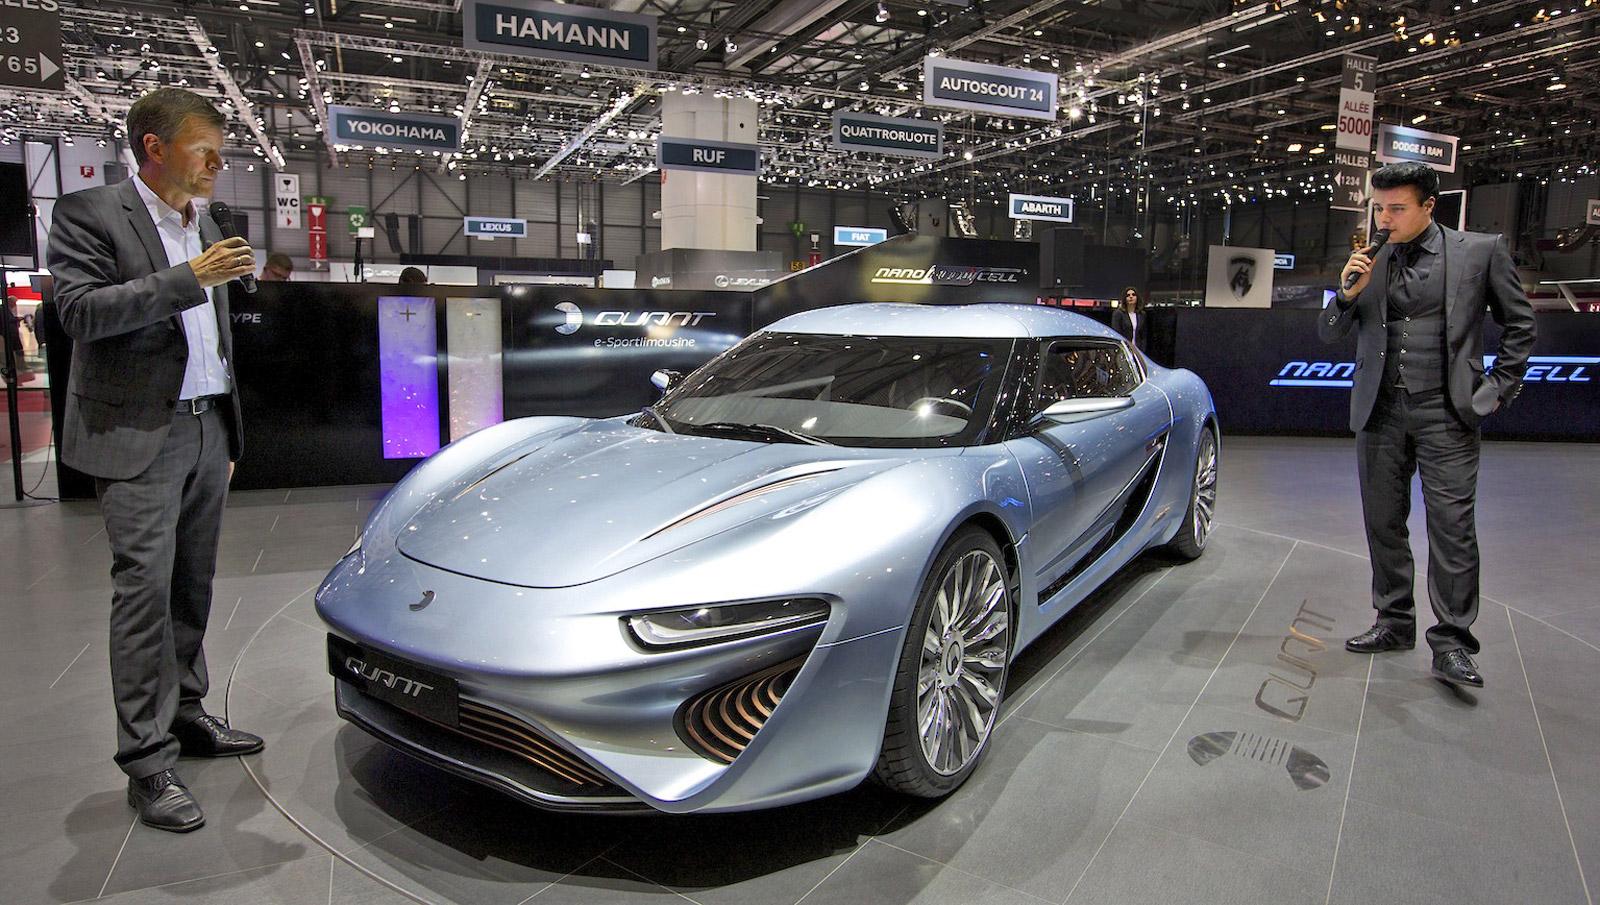 Quant Limousine Concept Pioneers Flow Cell Power Unit At